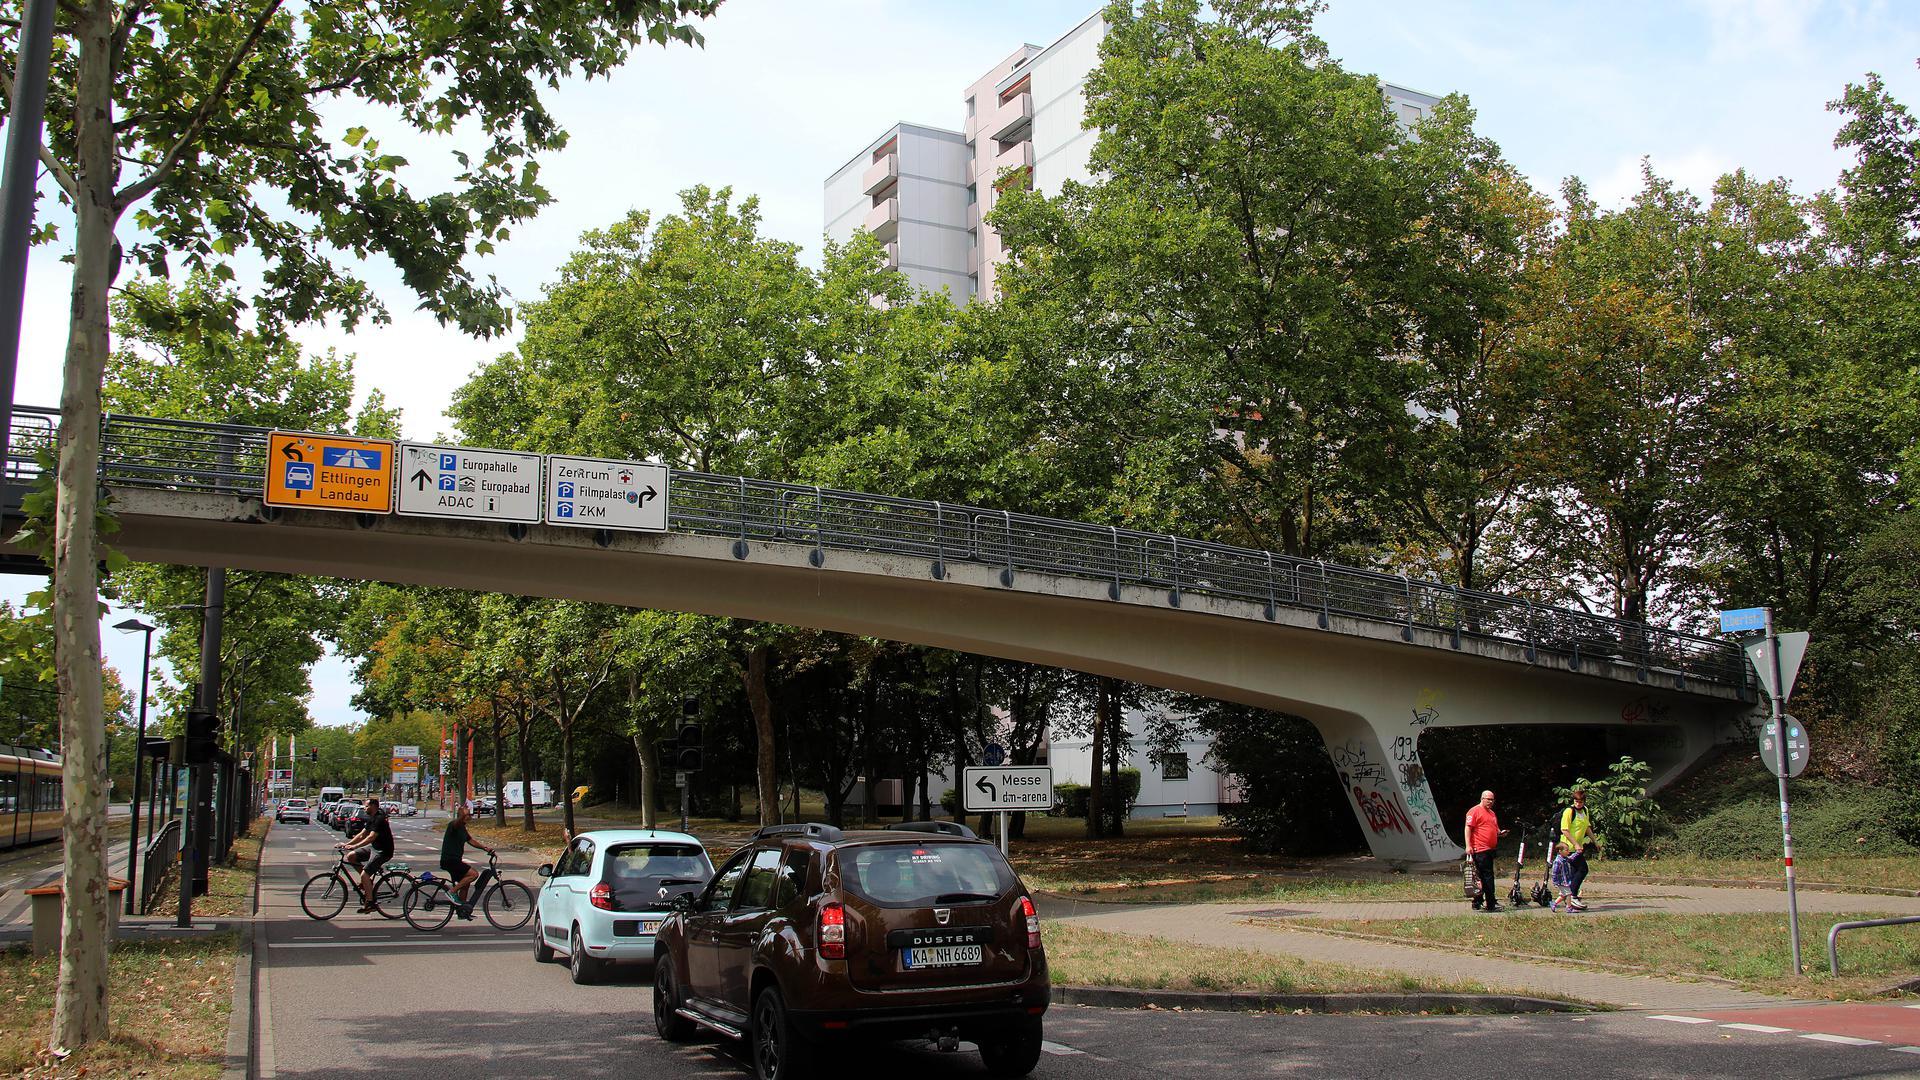 3.08.2020 Brücke über die Ebertstraße